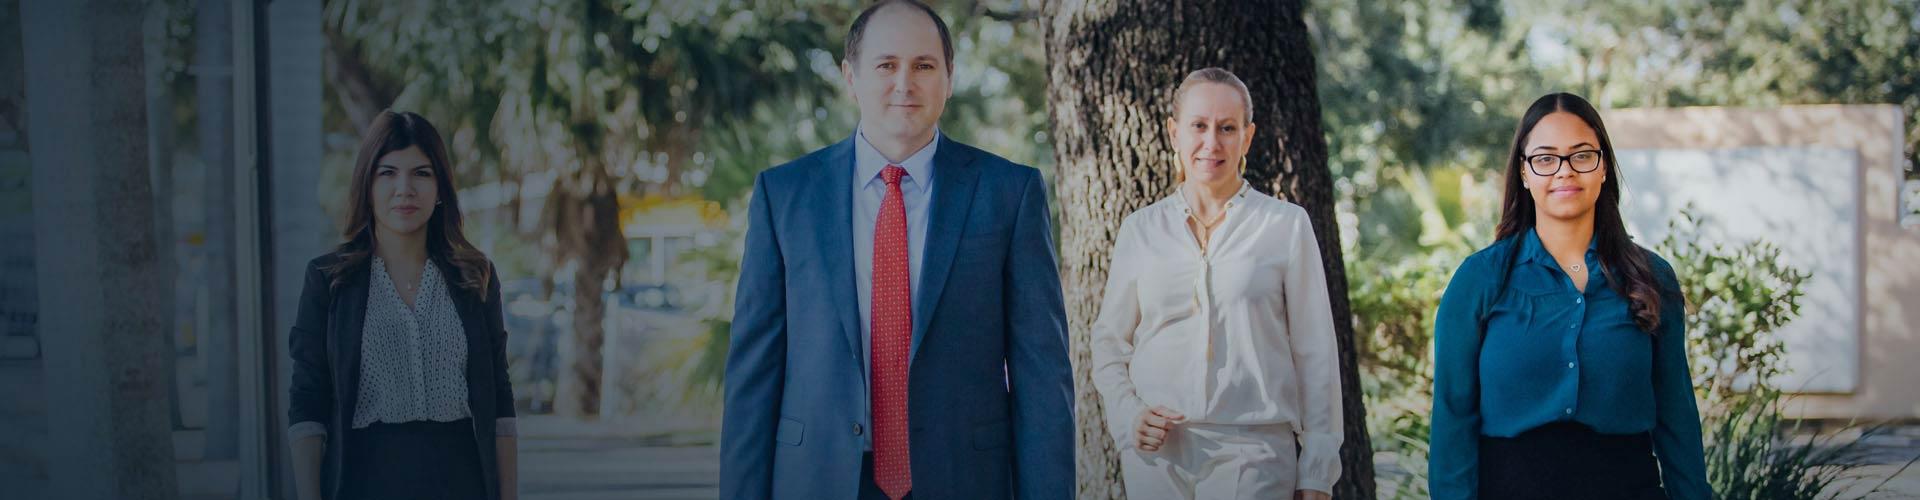 West Palm Beach Loan Modification Attorneys - Stiberman Law Firm